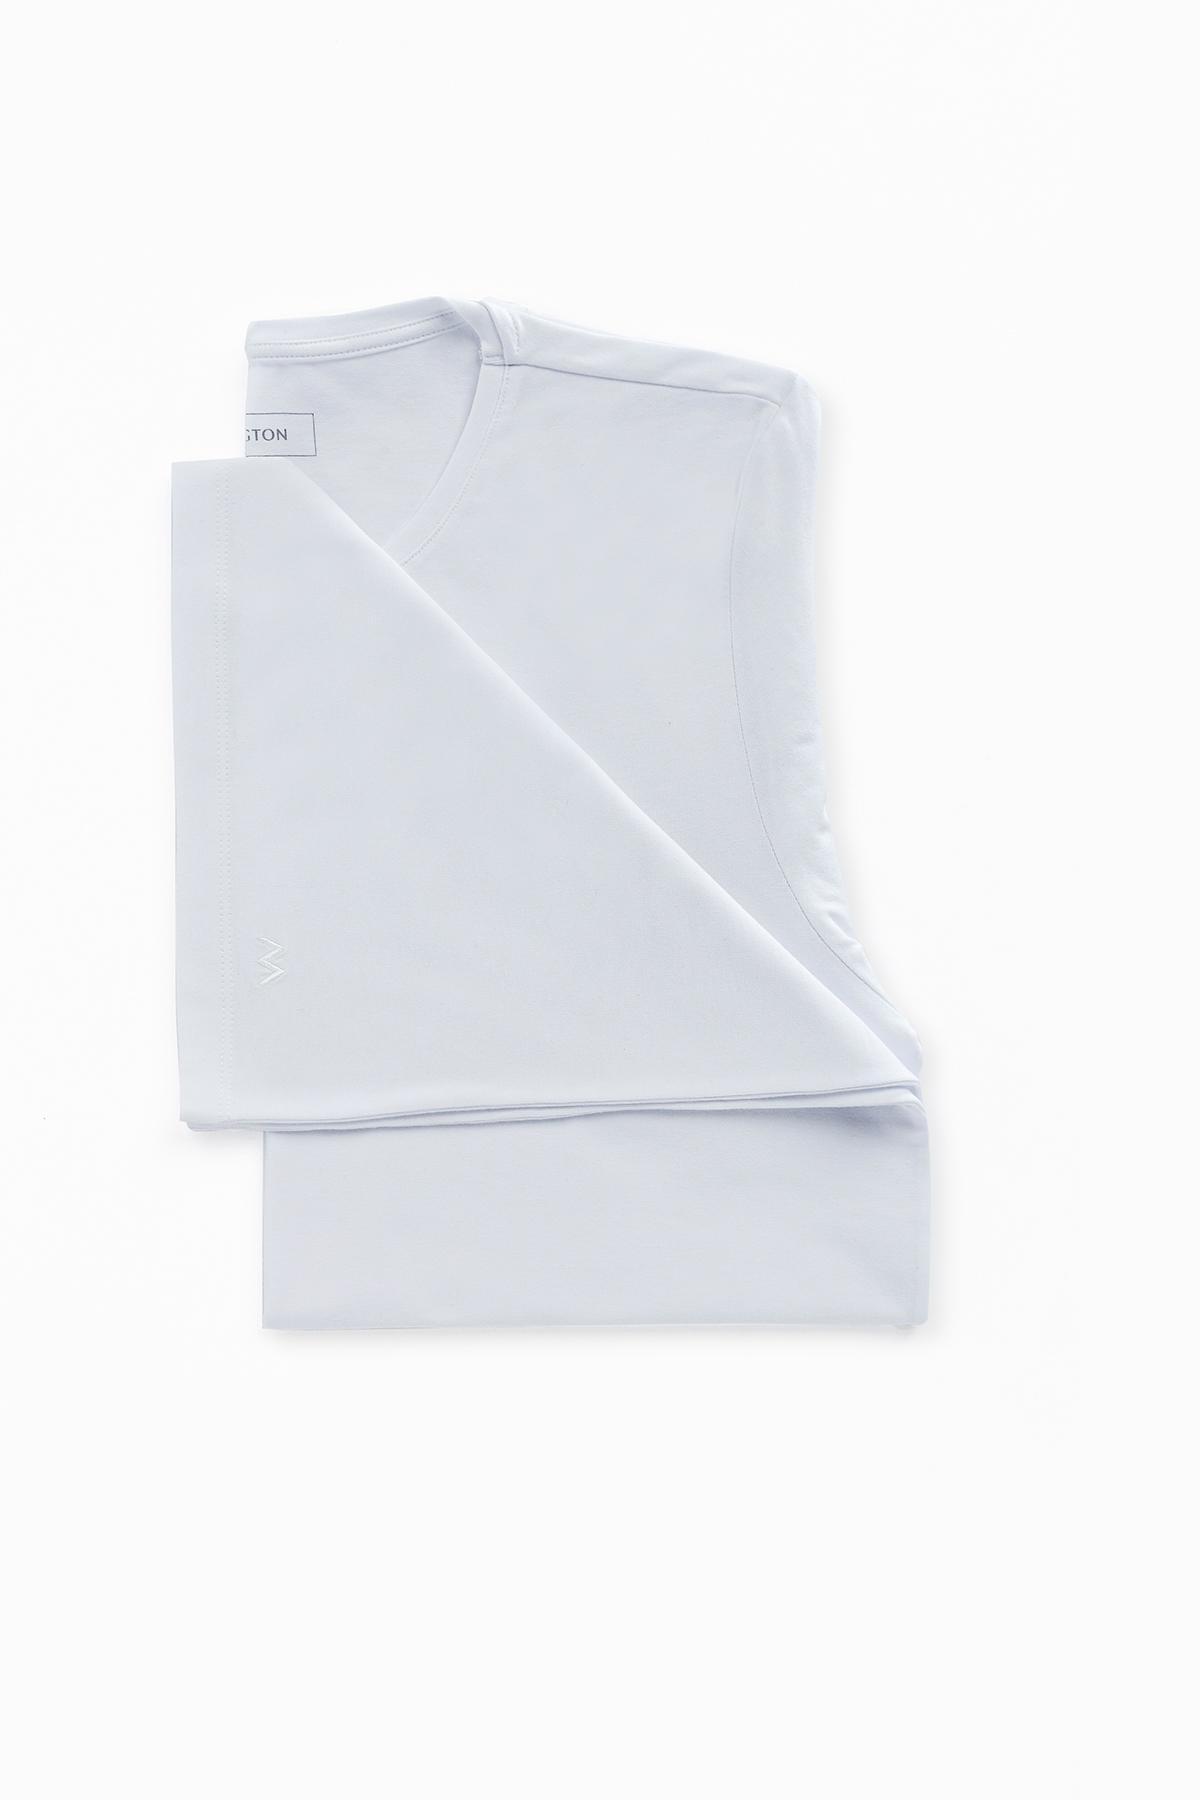 Siyah-Beyaz İkili İç Giyim T-Shirt Seti